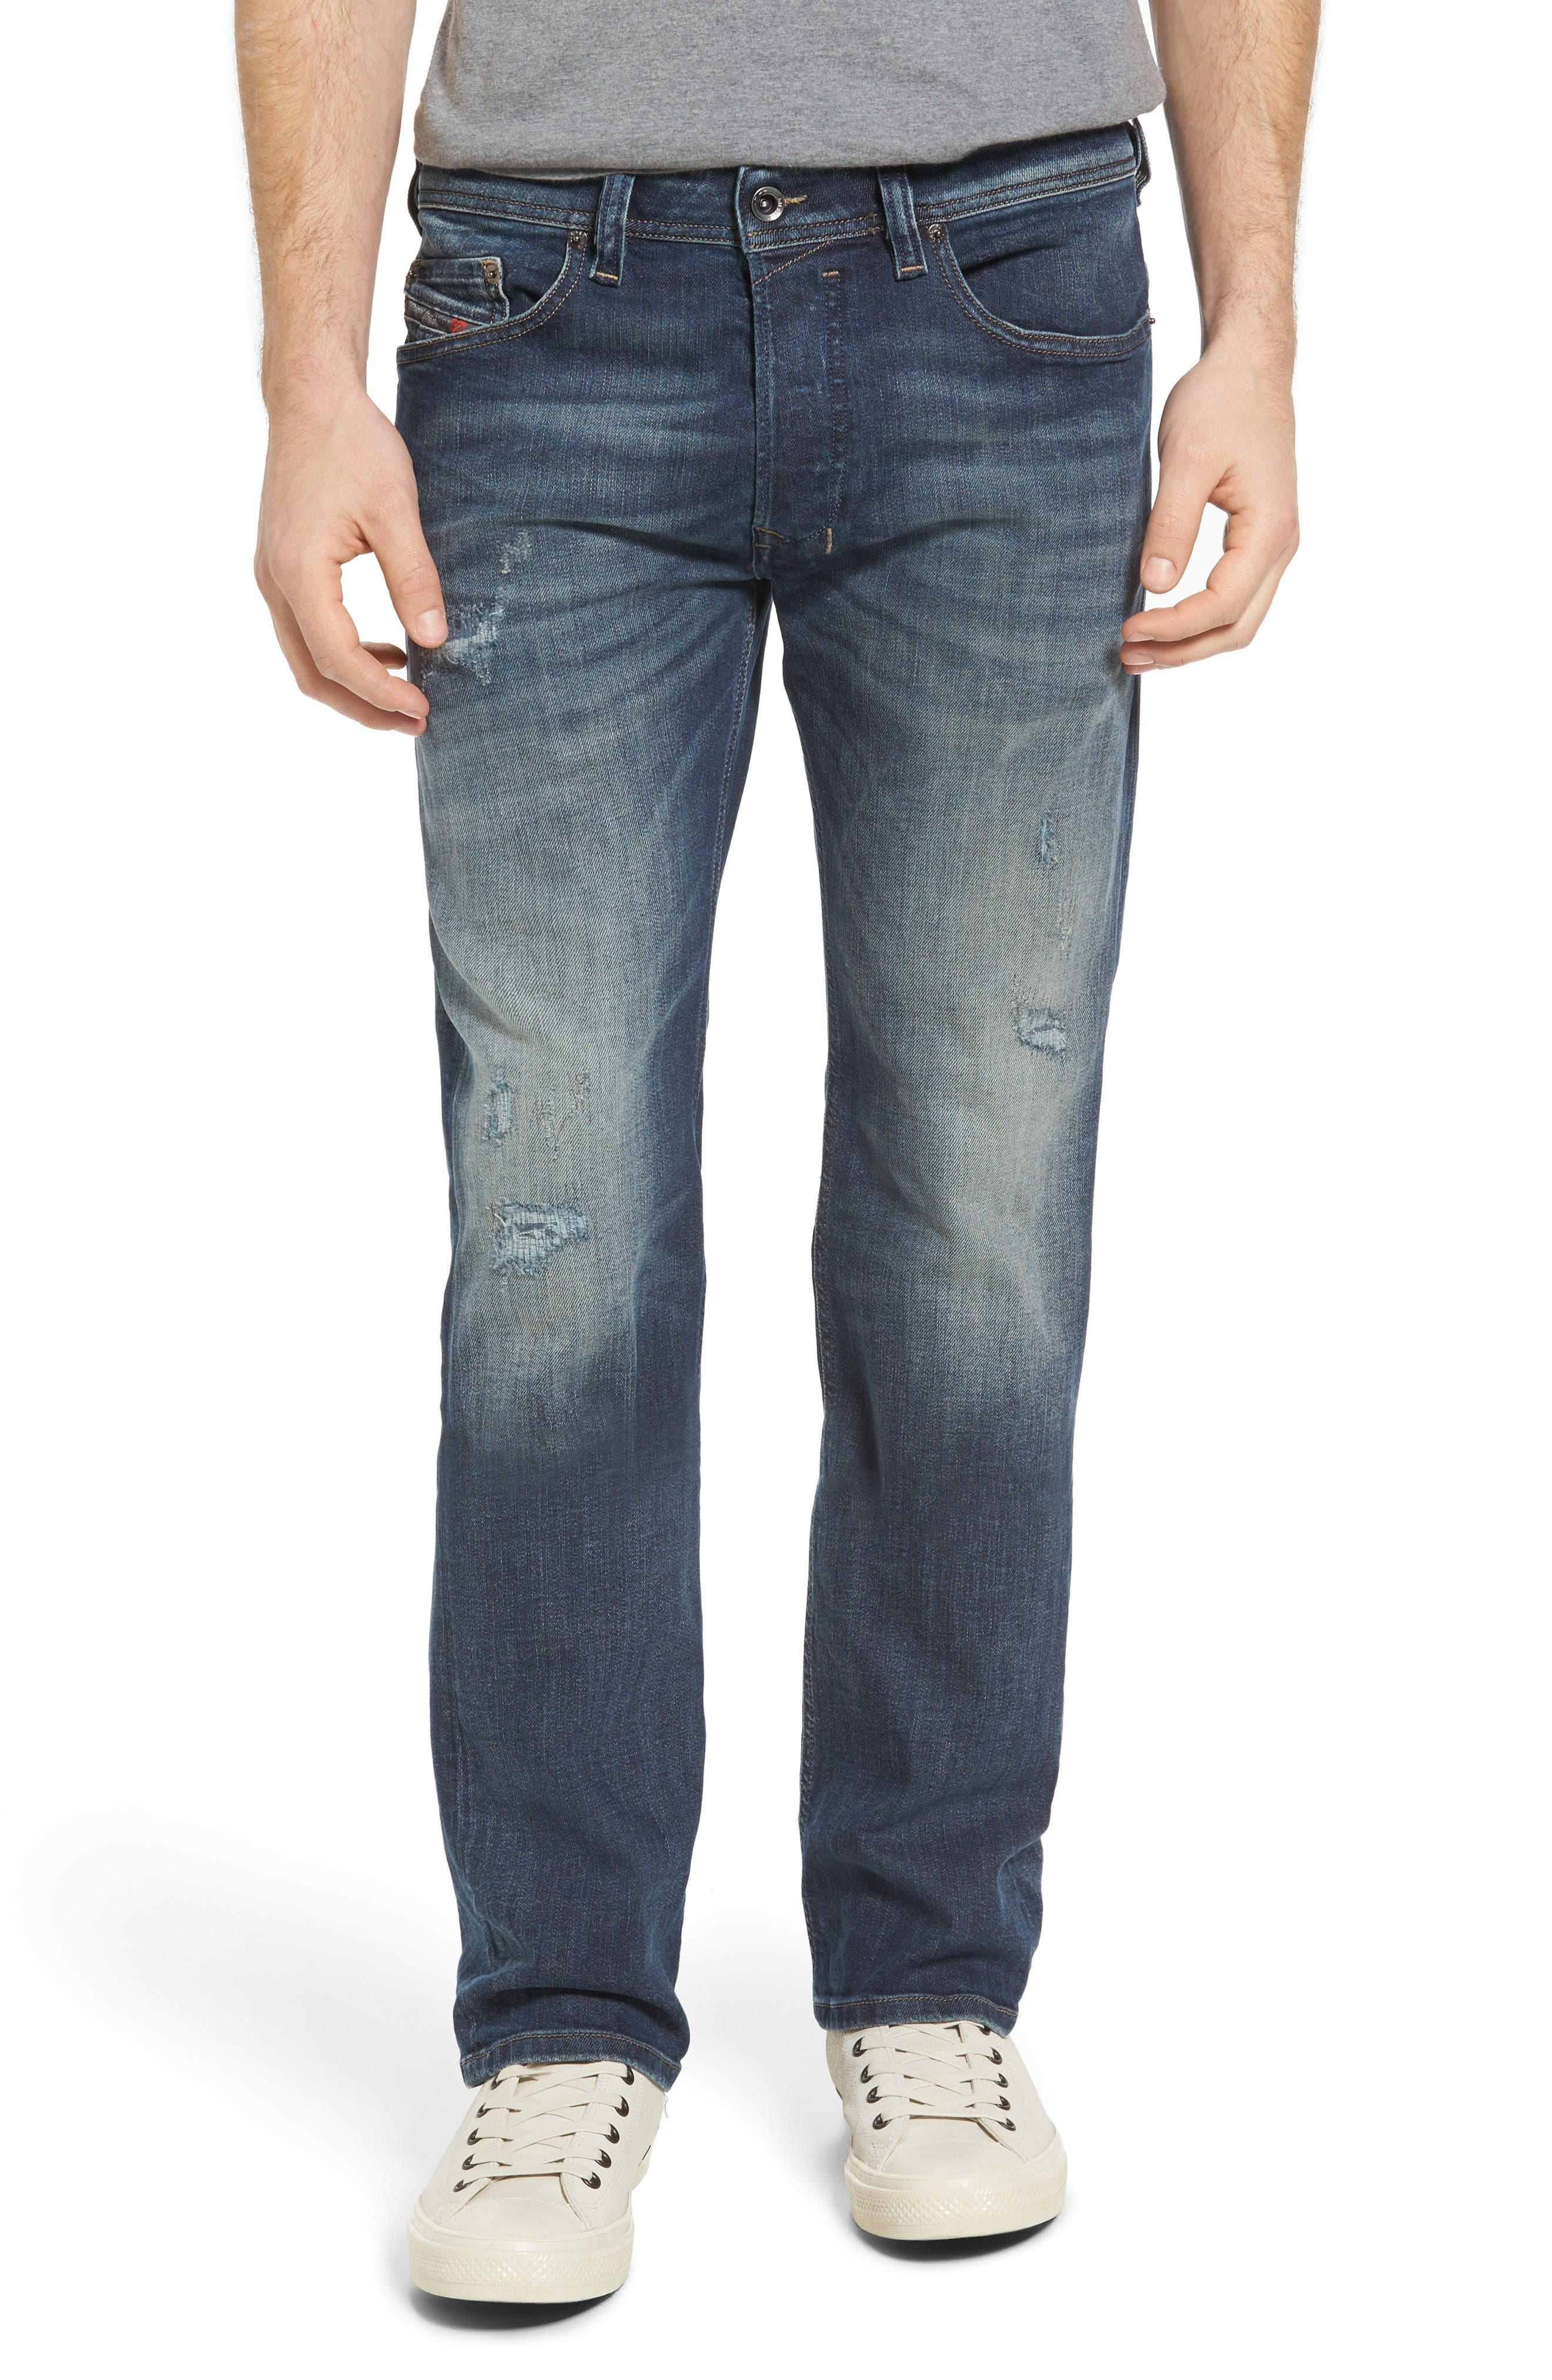 Safado Slim Straight Fit Jeans,                         Main,                         color, 860K